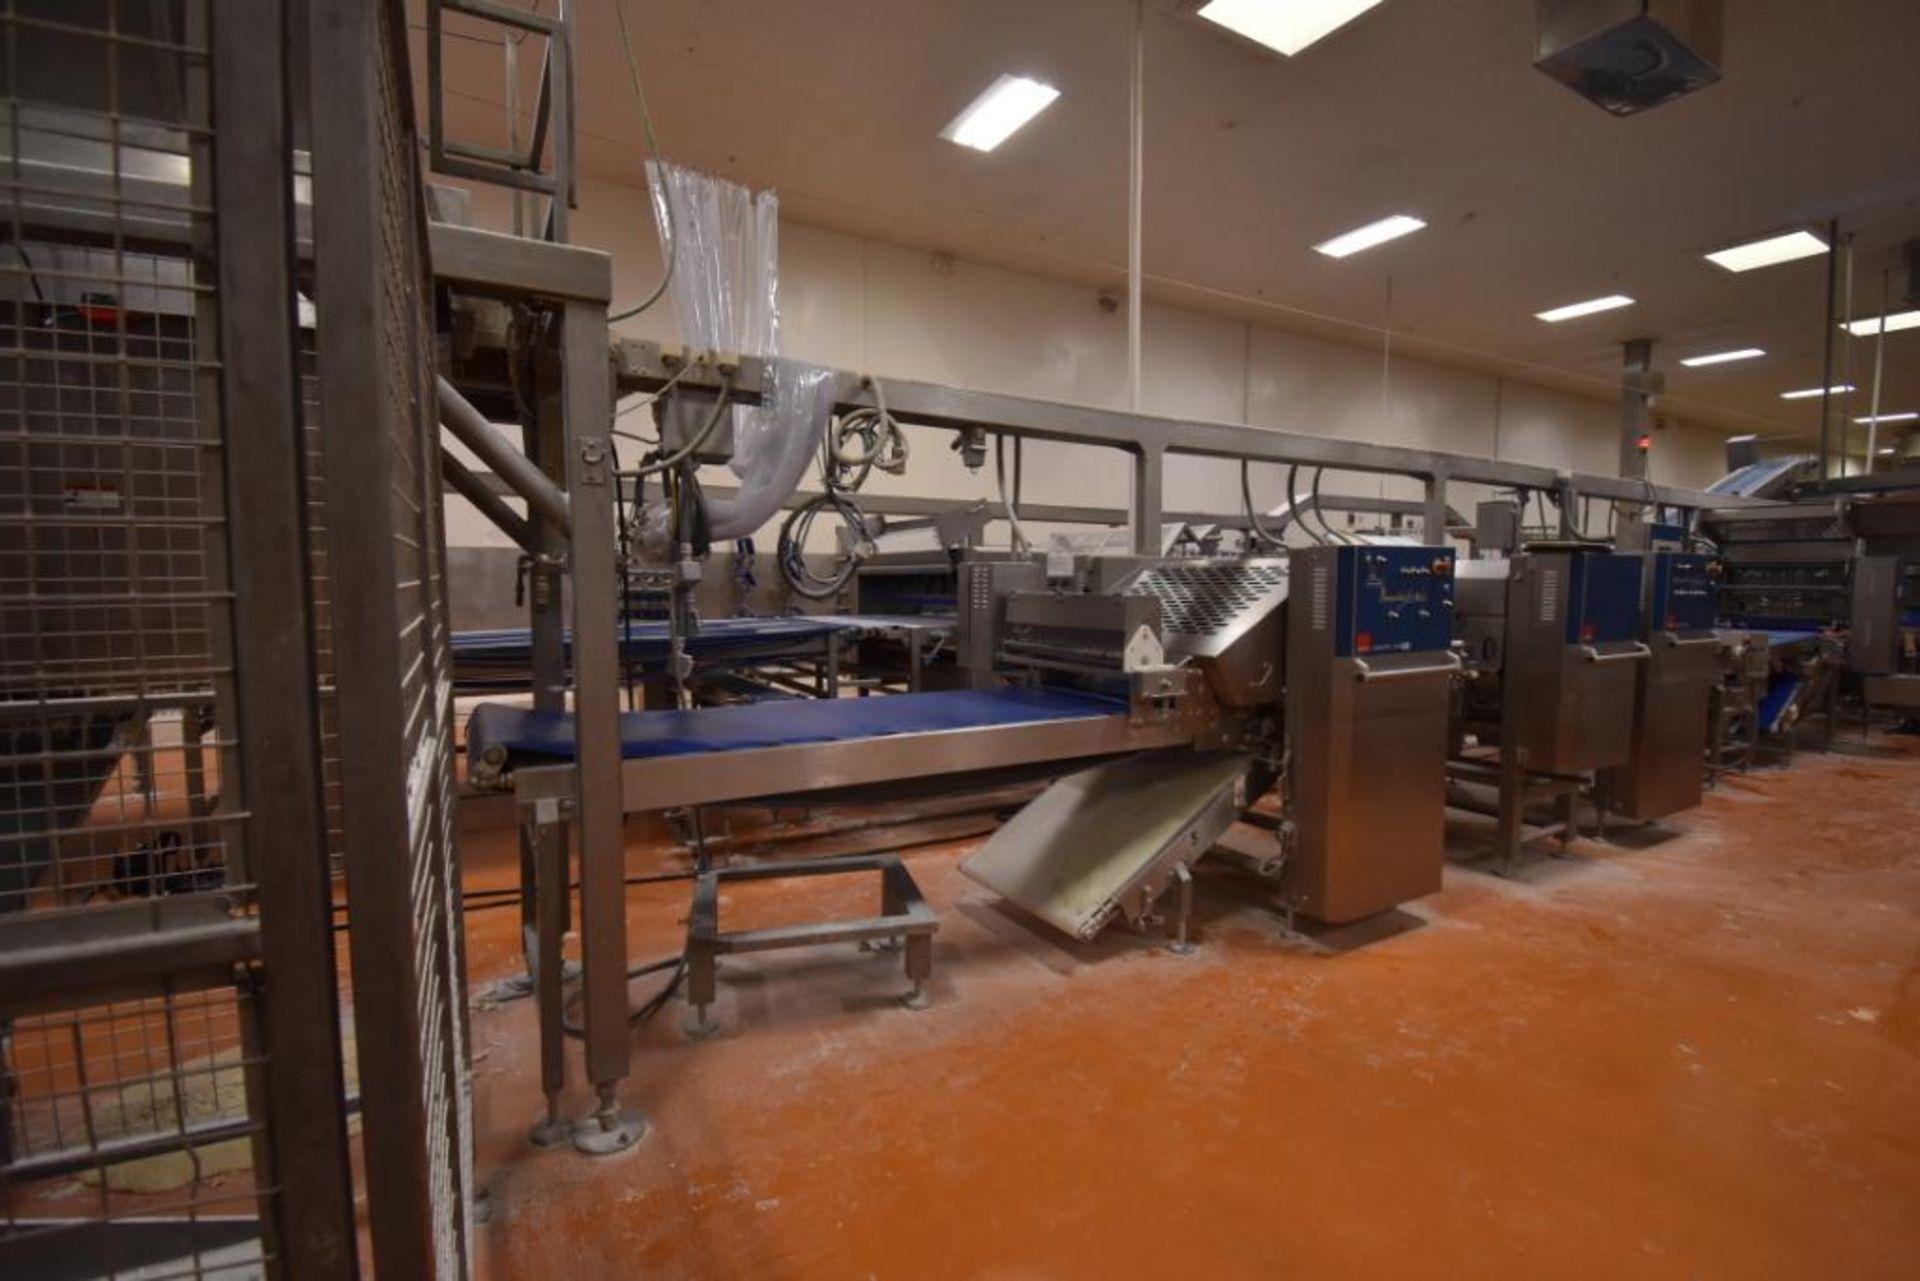 2007 Fritsch Laminator 3000 dough line - Image 52 of 280